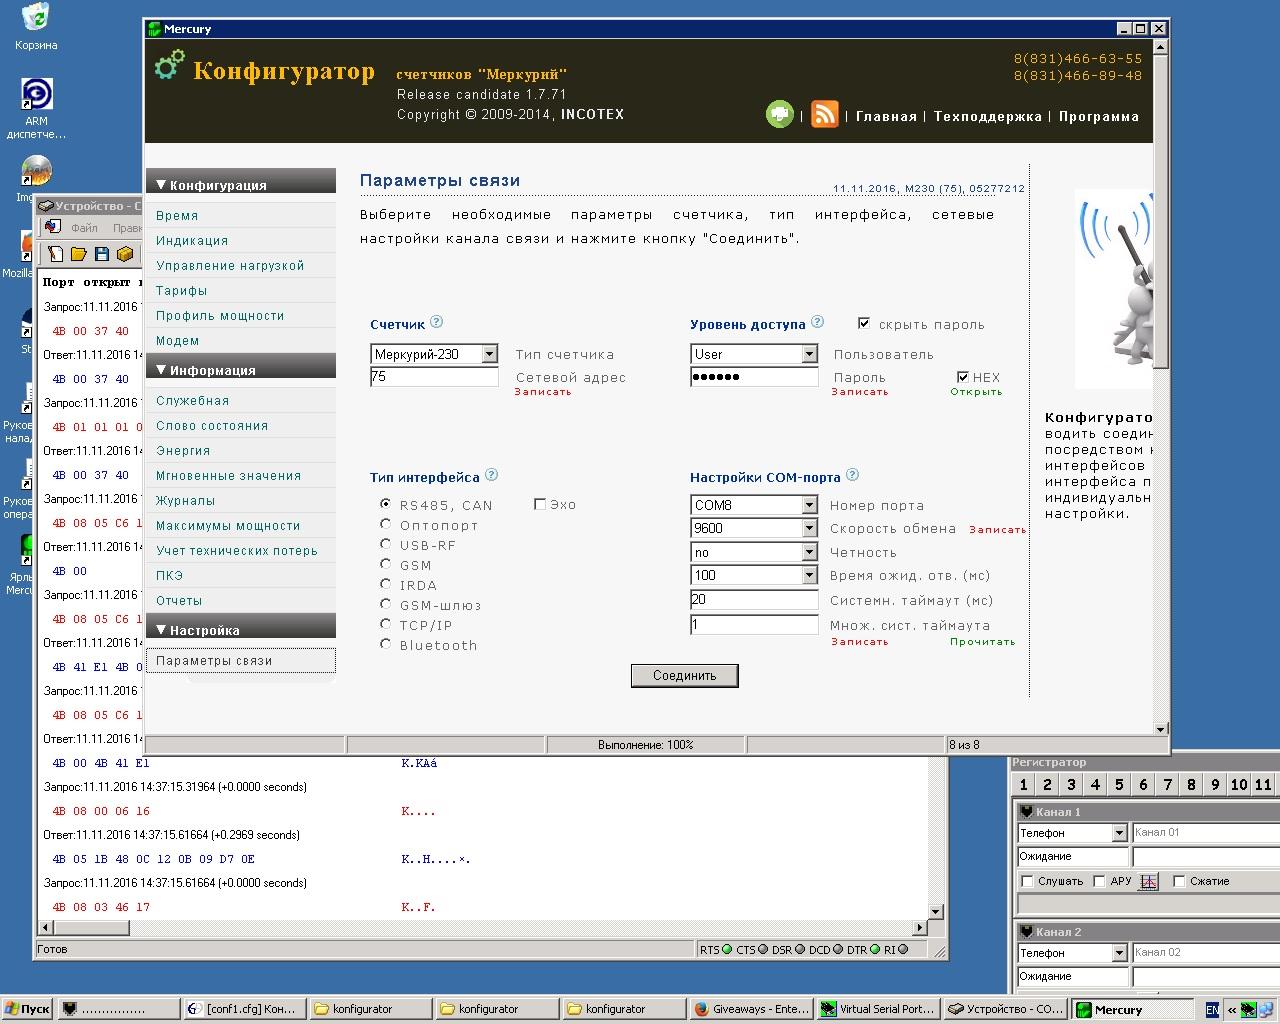 Пишем протоколы счетчиков Меркурий 230 и Меркурий 200 для OpenSCADA - 2